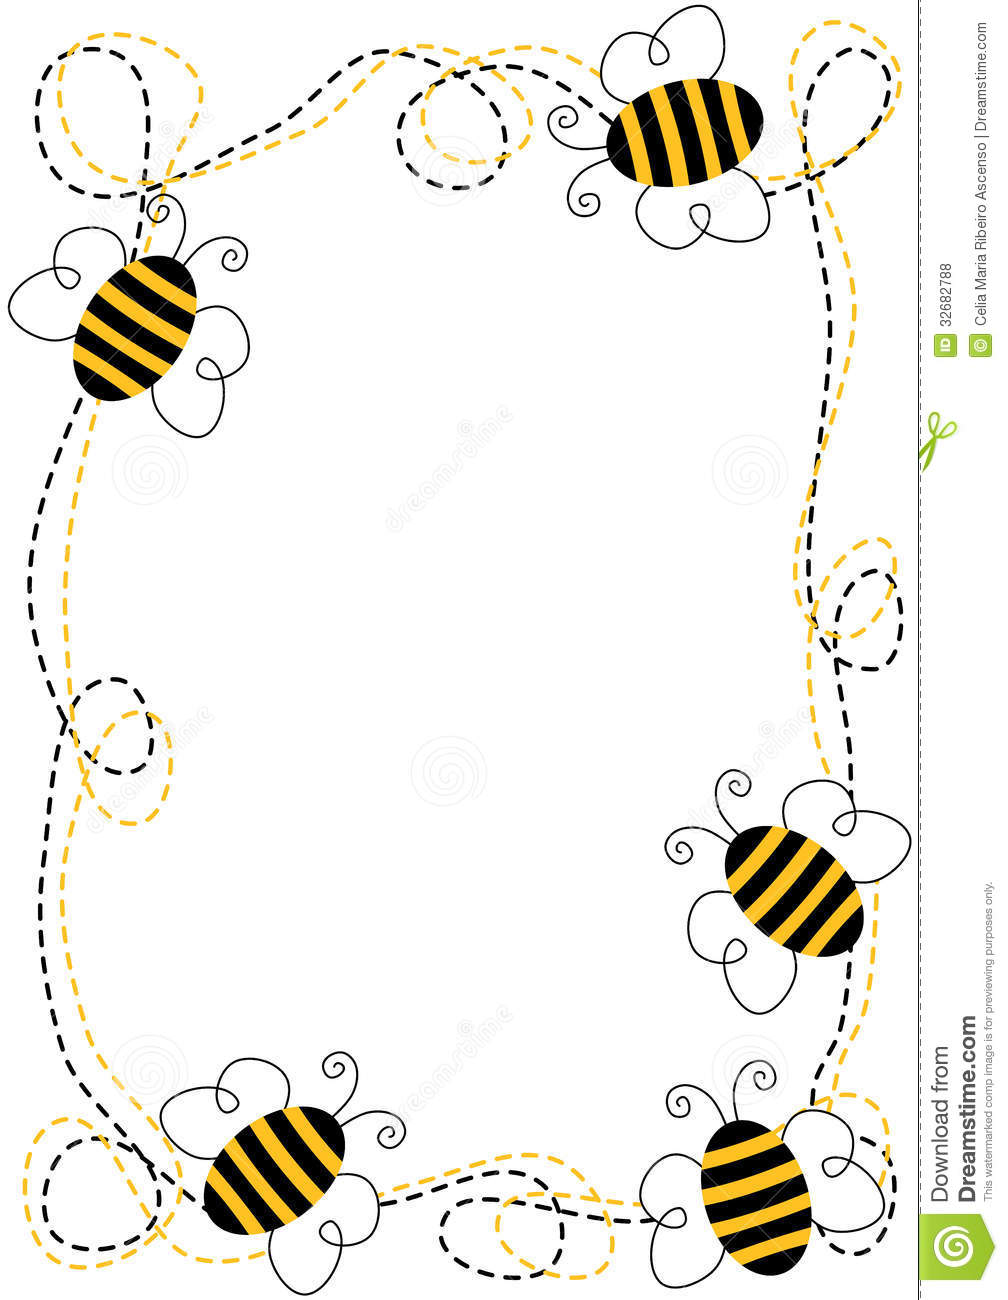 44+] Honey Bee Wallpaper Border on WallpaperSafari.